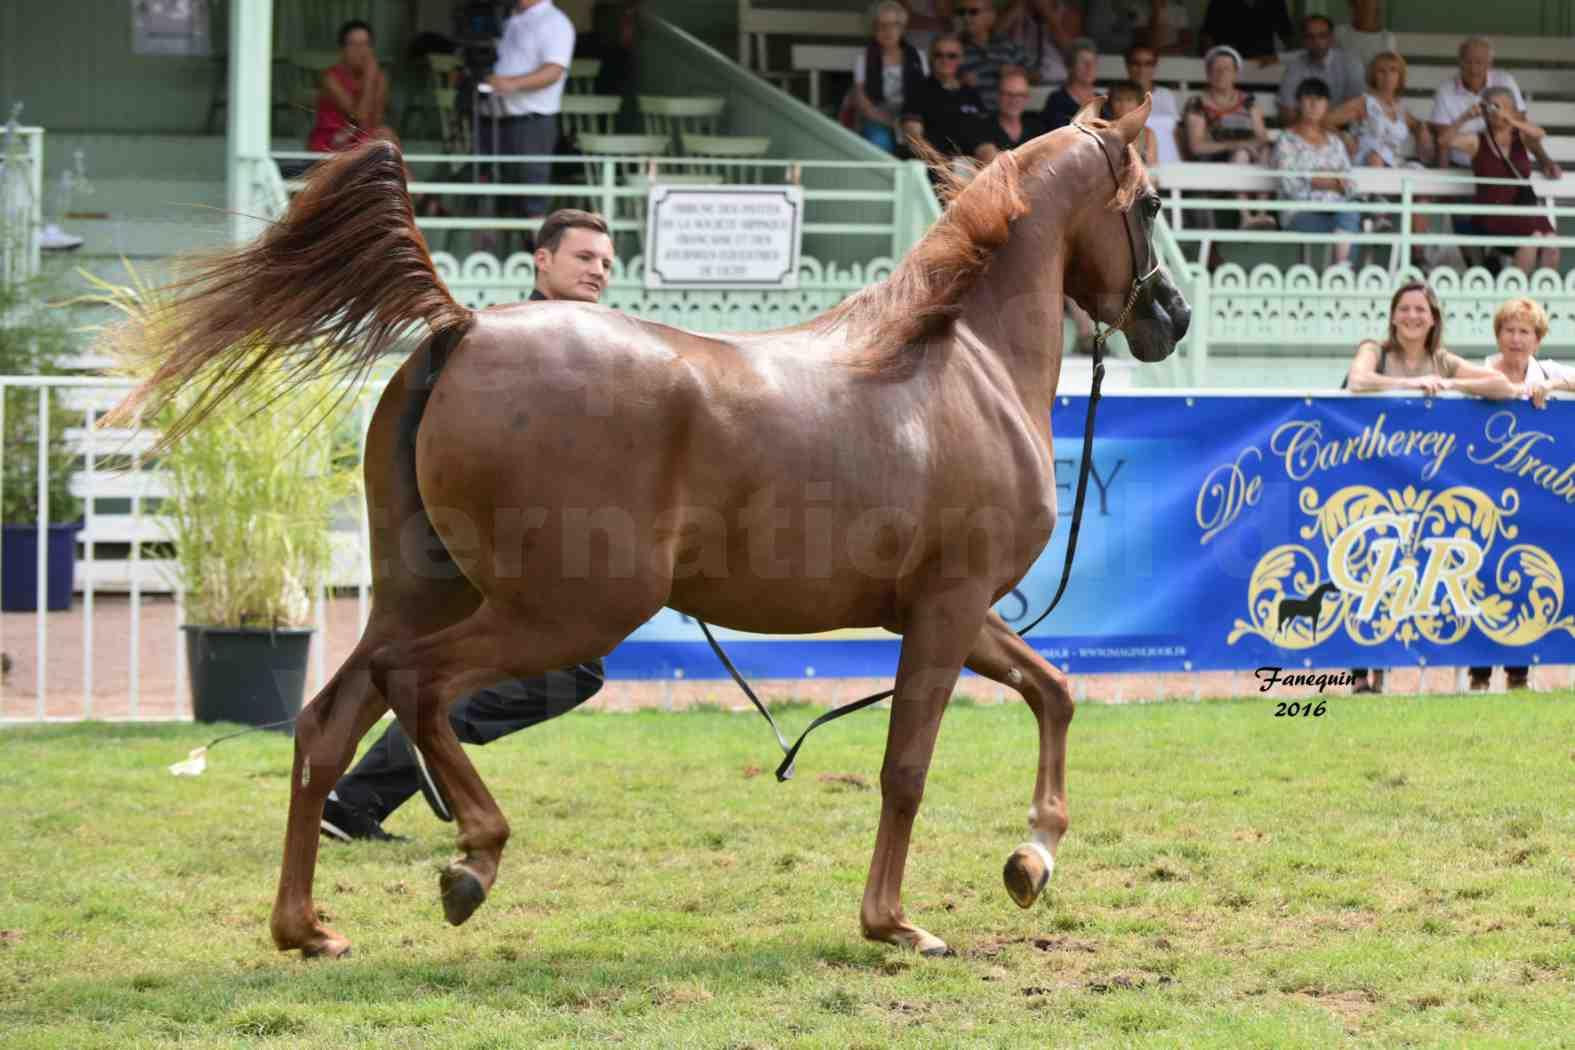 International Arabian Horse Show B de VICHY 2016 - PEARL DE DJOON - Notre Sélection - 32